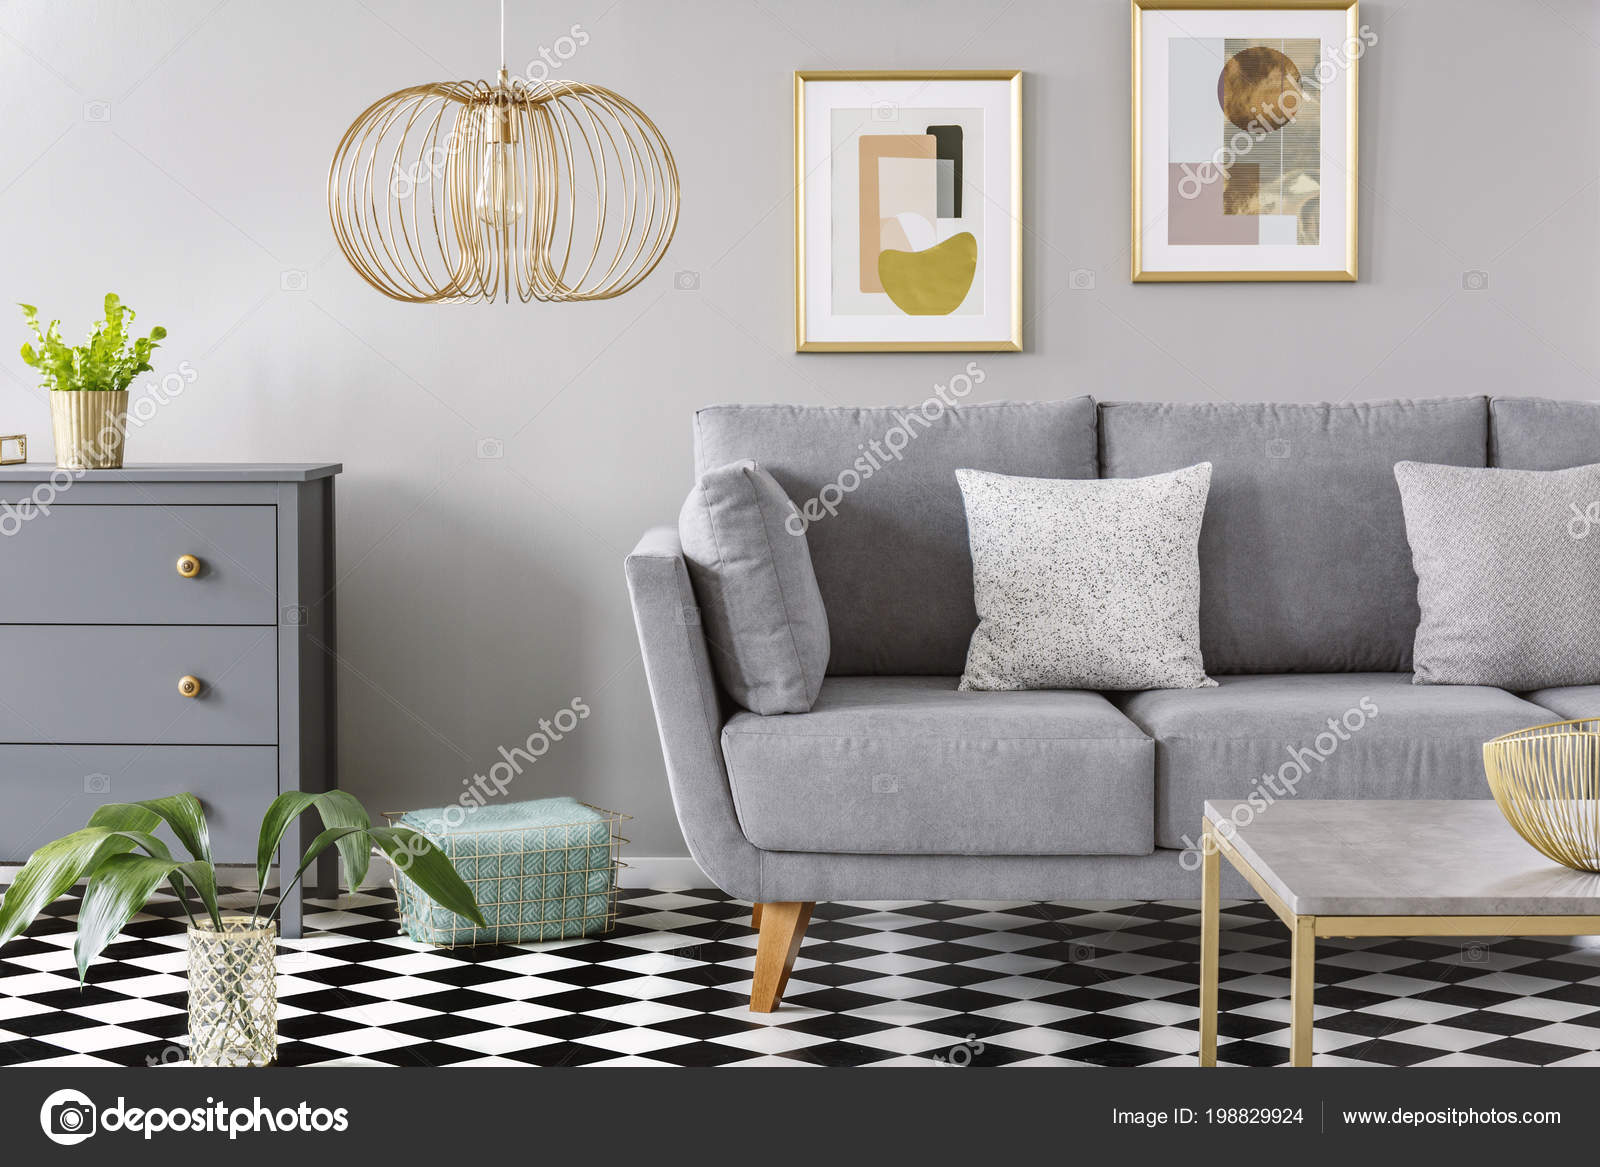 https://st4.depositphotos.com/2249091/19882/i/1600/depositphotos_198829924-stockafbeelding-gouden-lamp-grijs-woonkamer-interieur.jpg